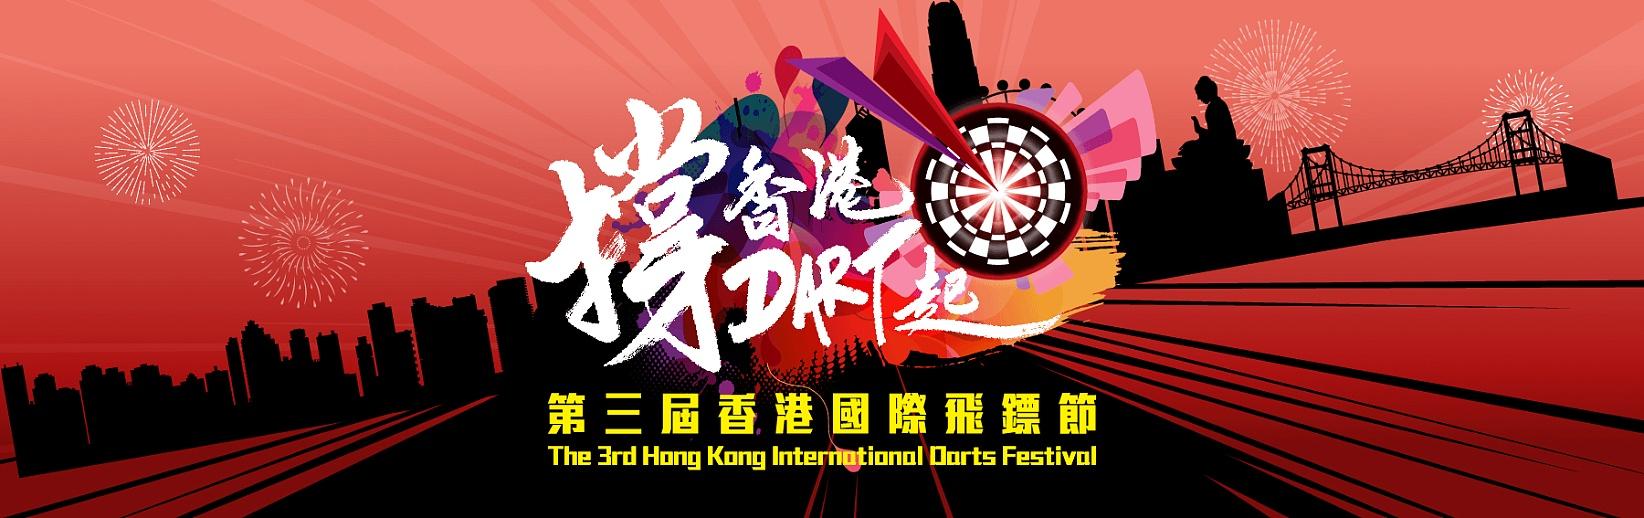 The 3rd Hong Kong International Darts Festival